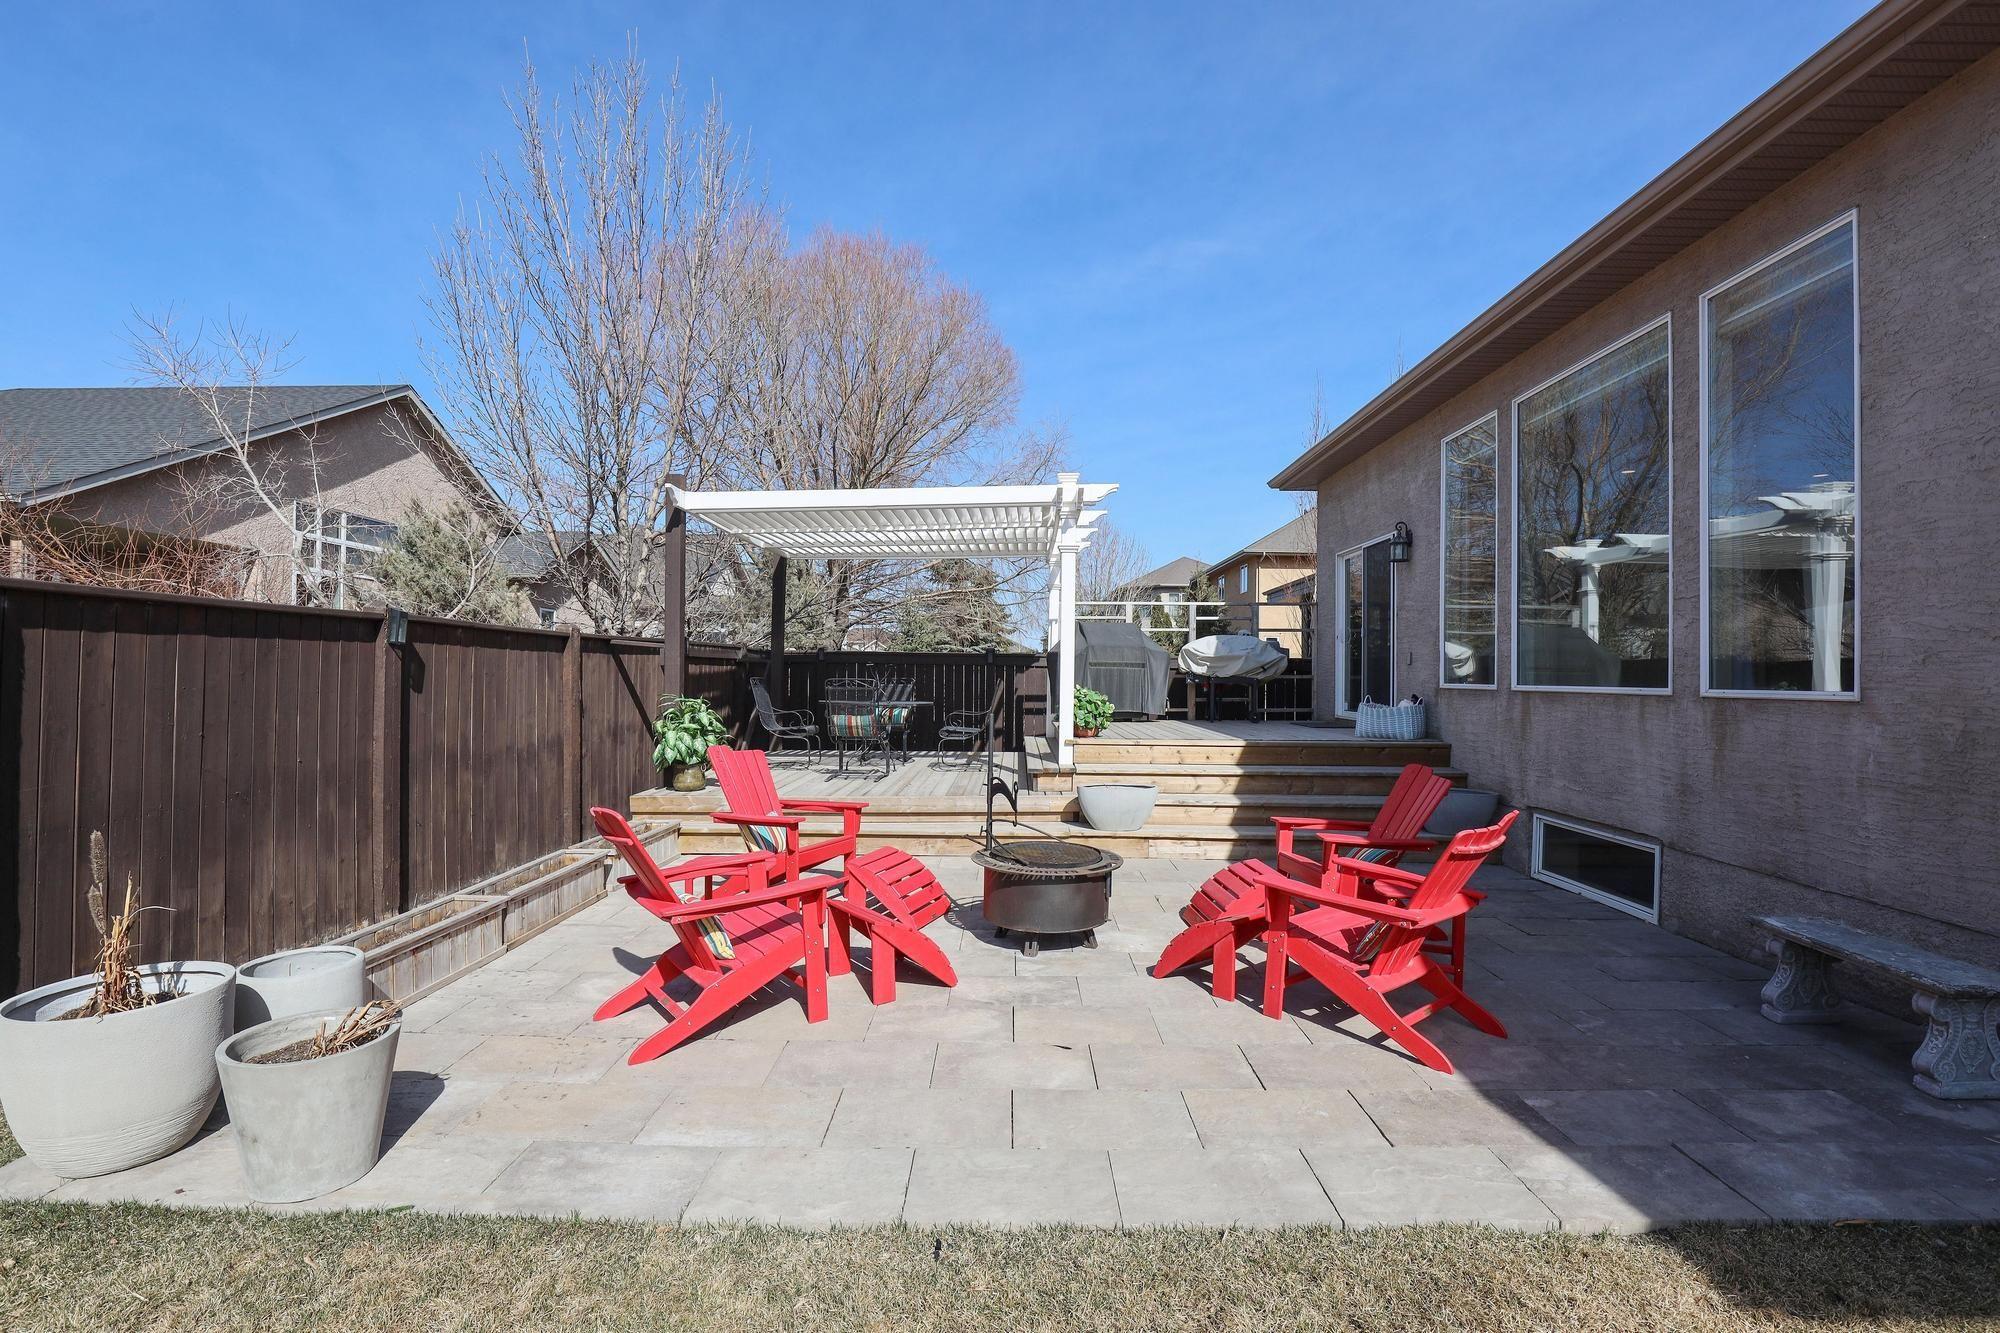 Photo 37: Photos: 7 Castle Ridge Drive in Winnipeg: Linden Ridge Single Family Detached for sale (1M)  : MLS®# 202107901